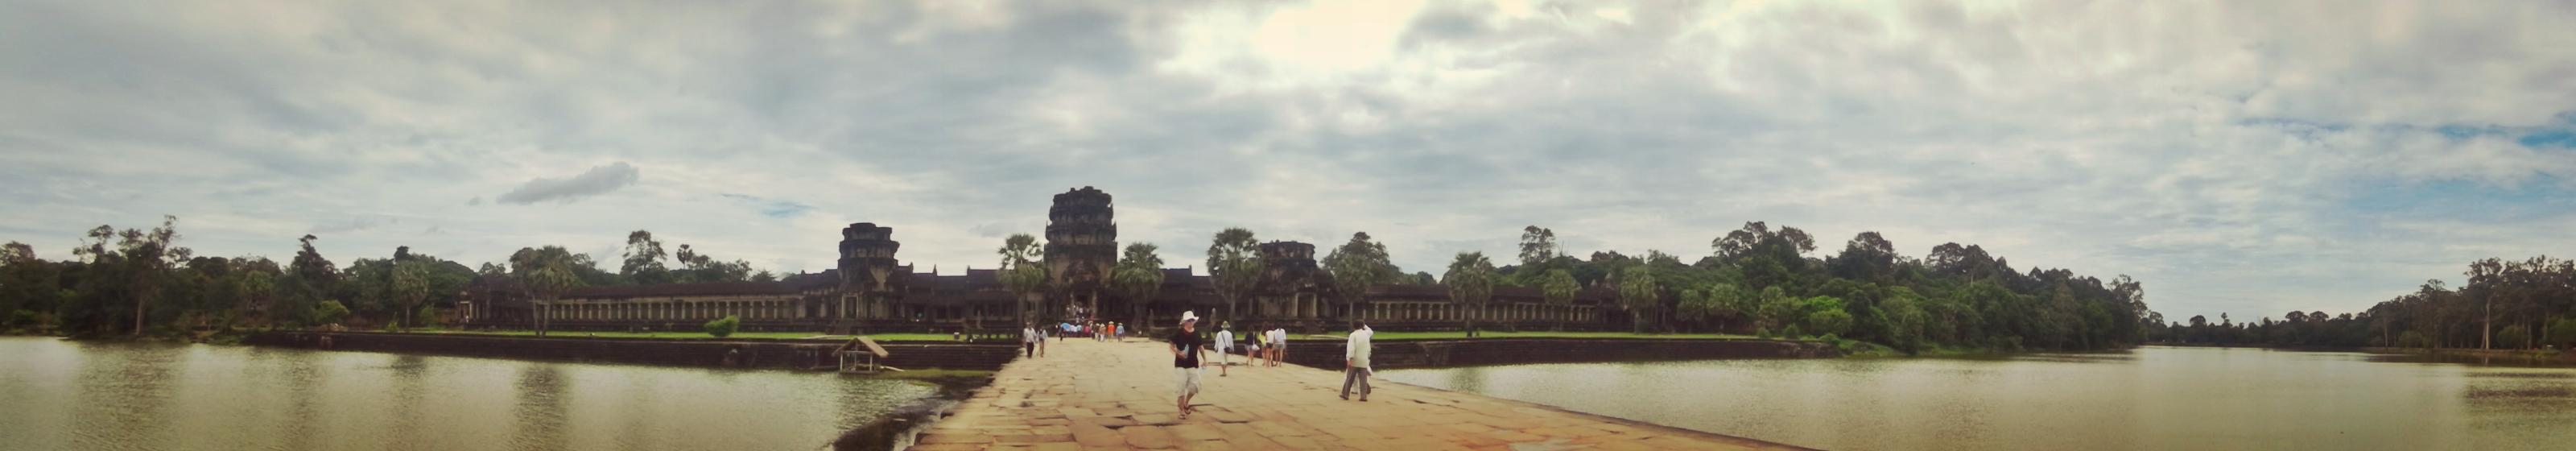 Cambodge, Angkor, temple, Asie, voyage, khmer,